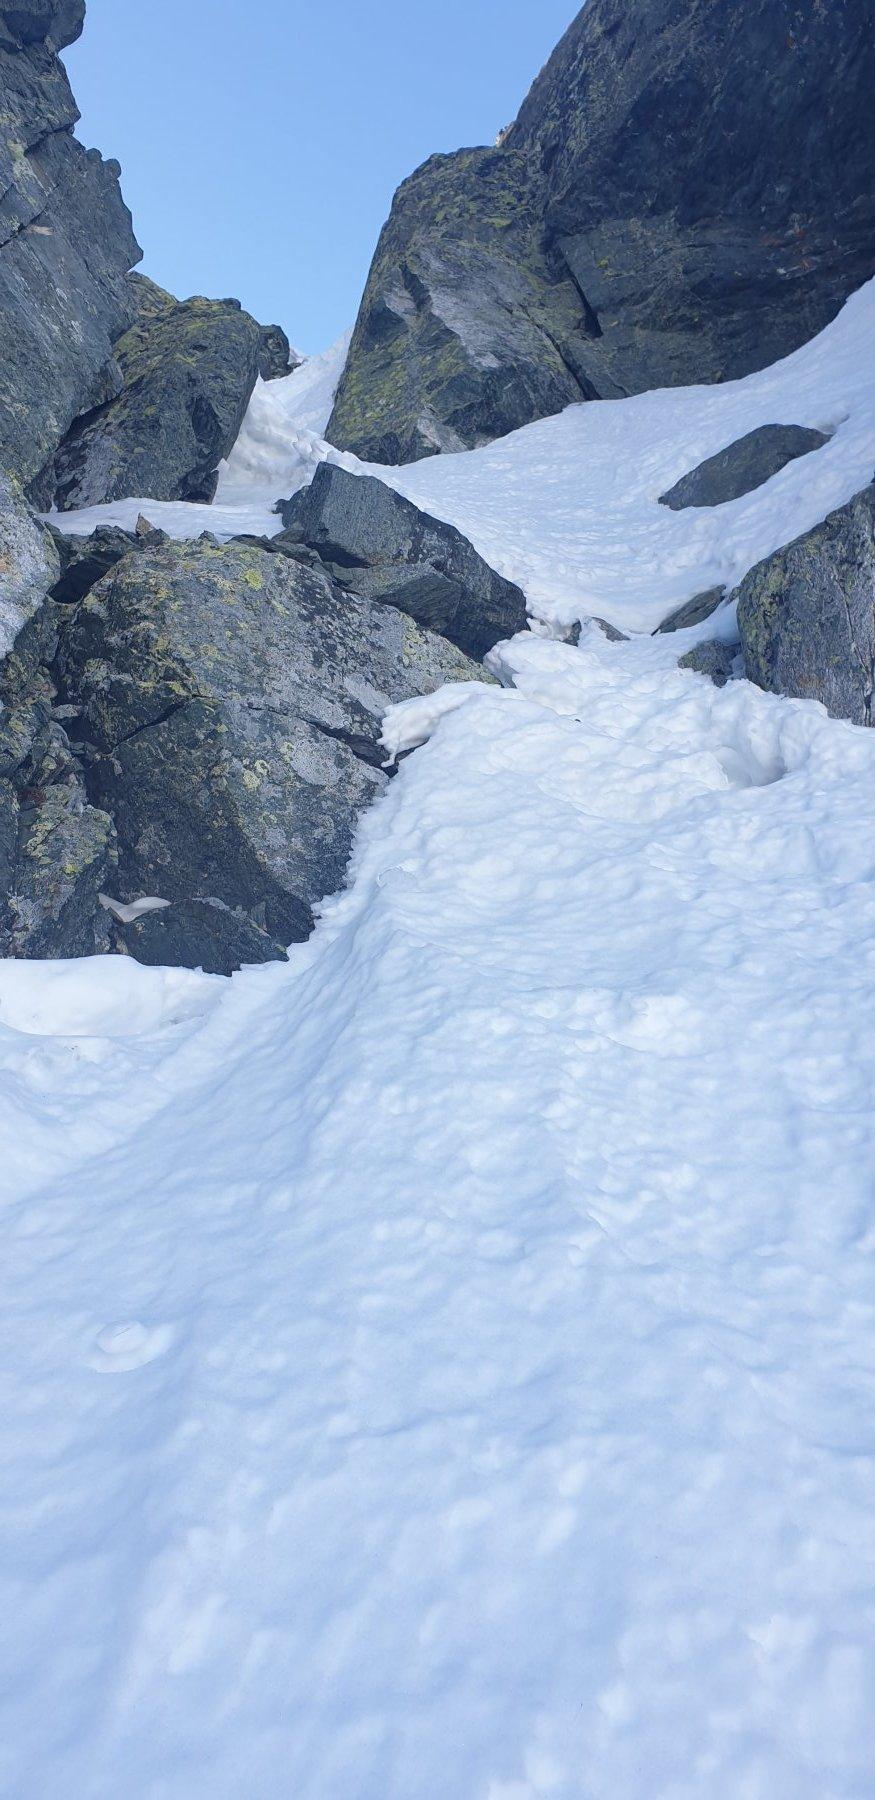 Neve di marmo